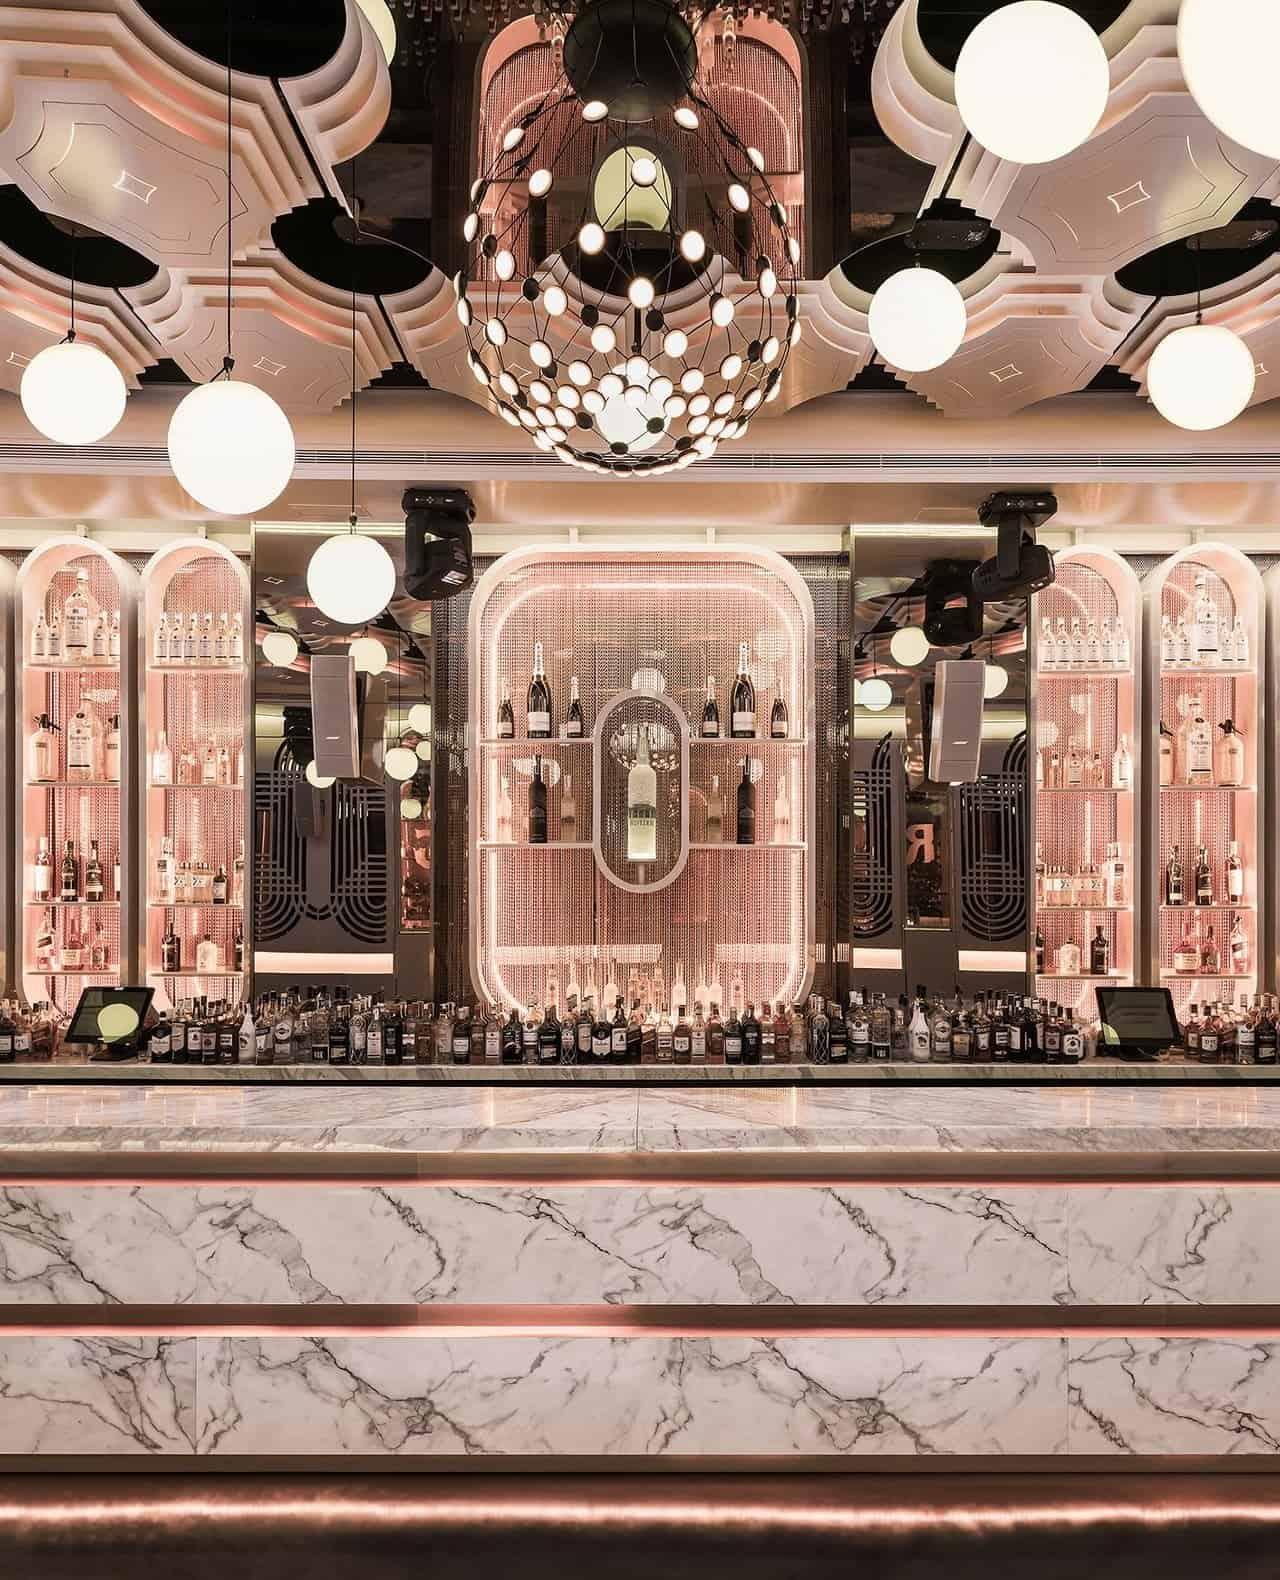 Nachtclub Pastrami in Malaga